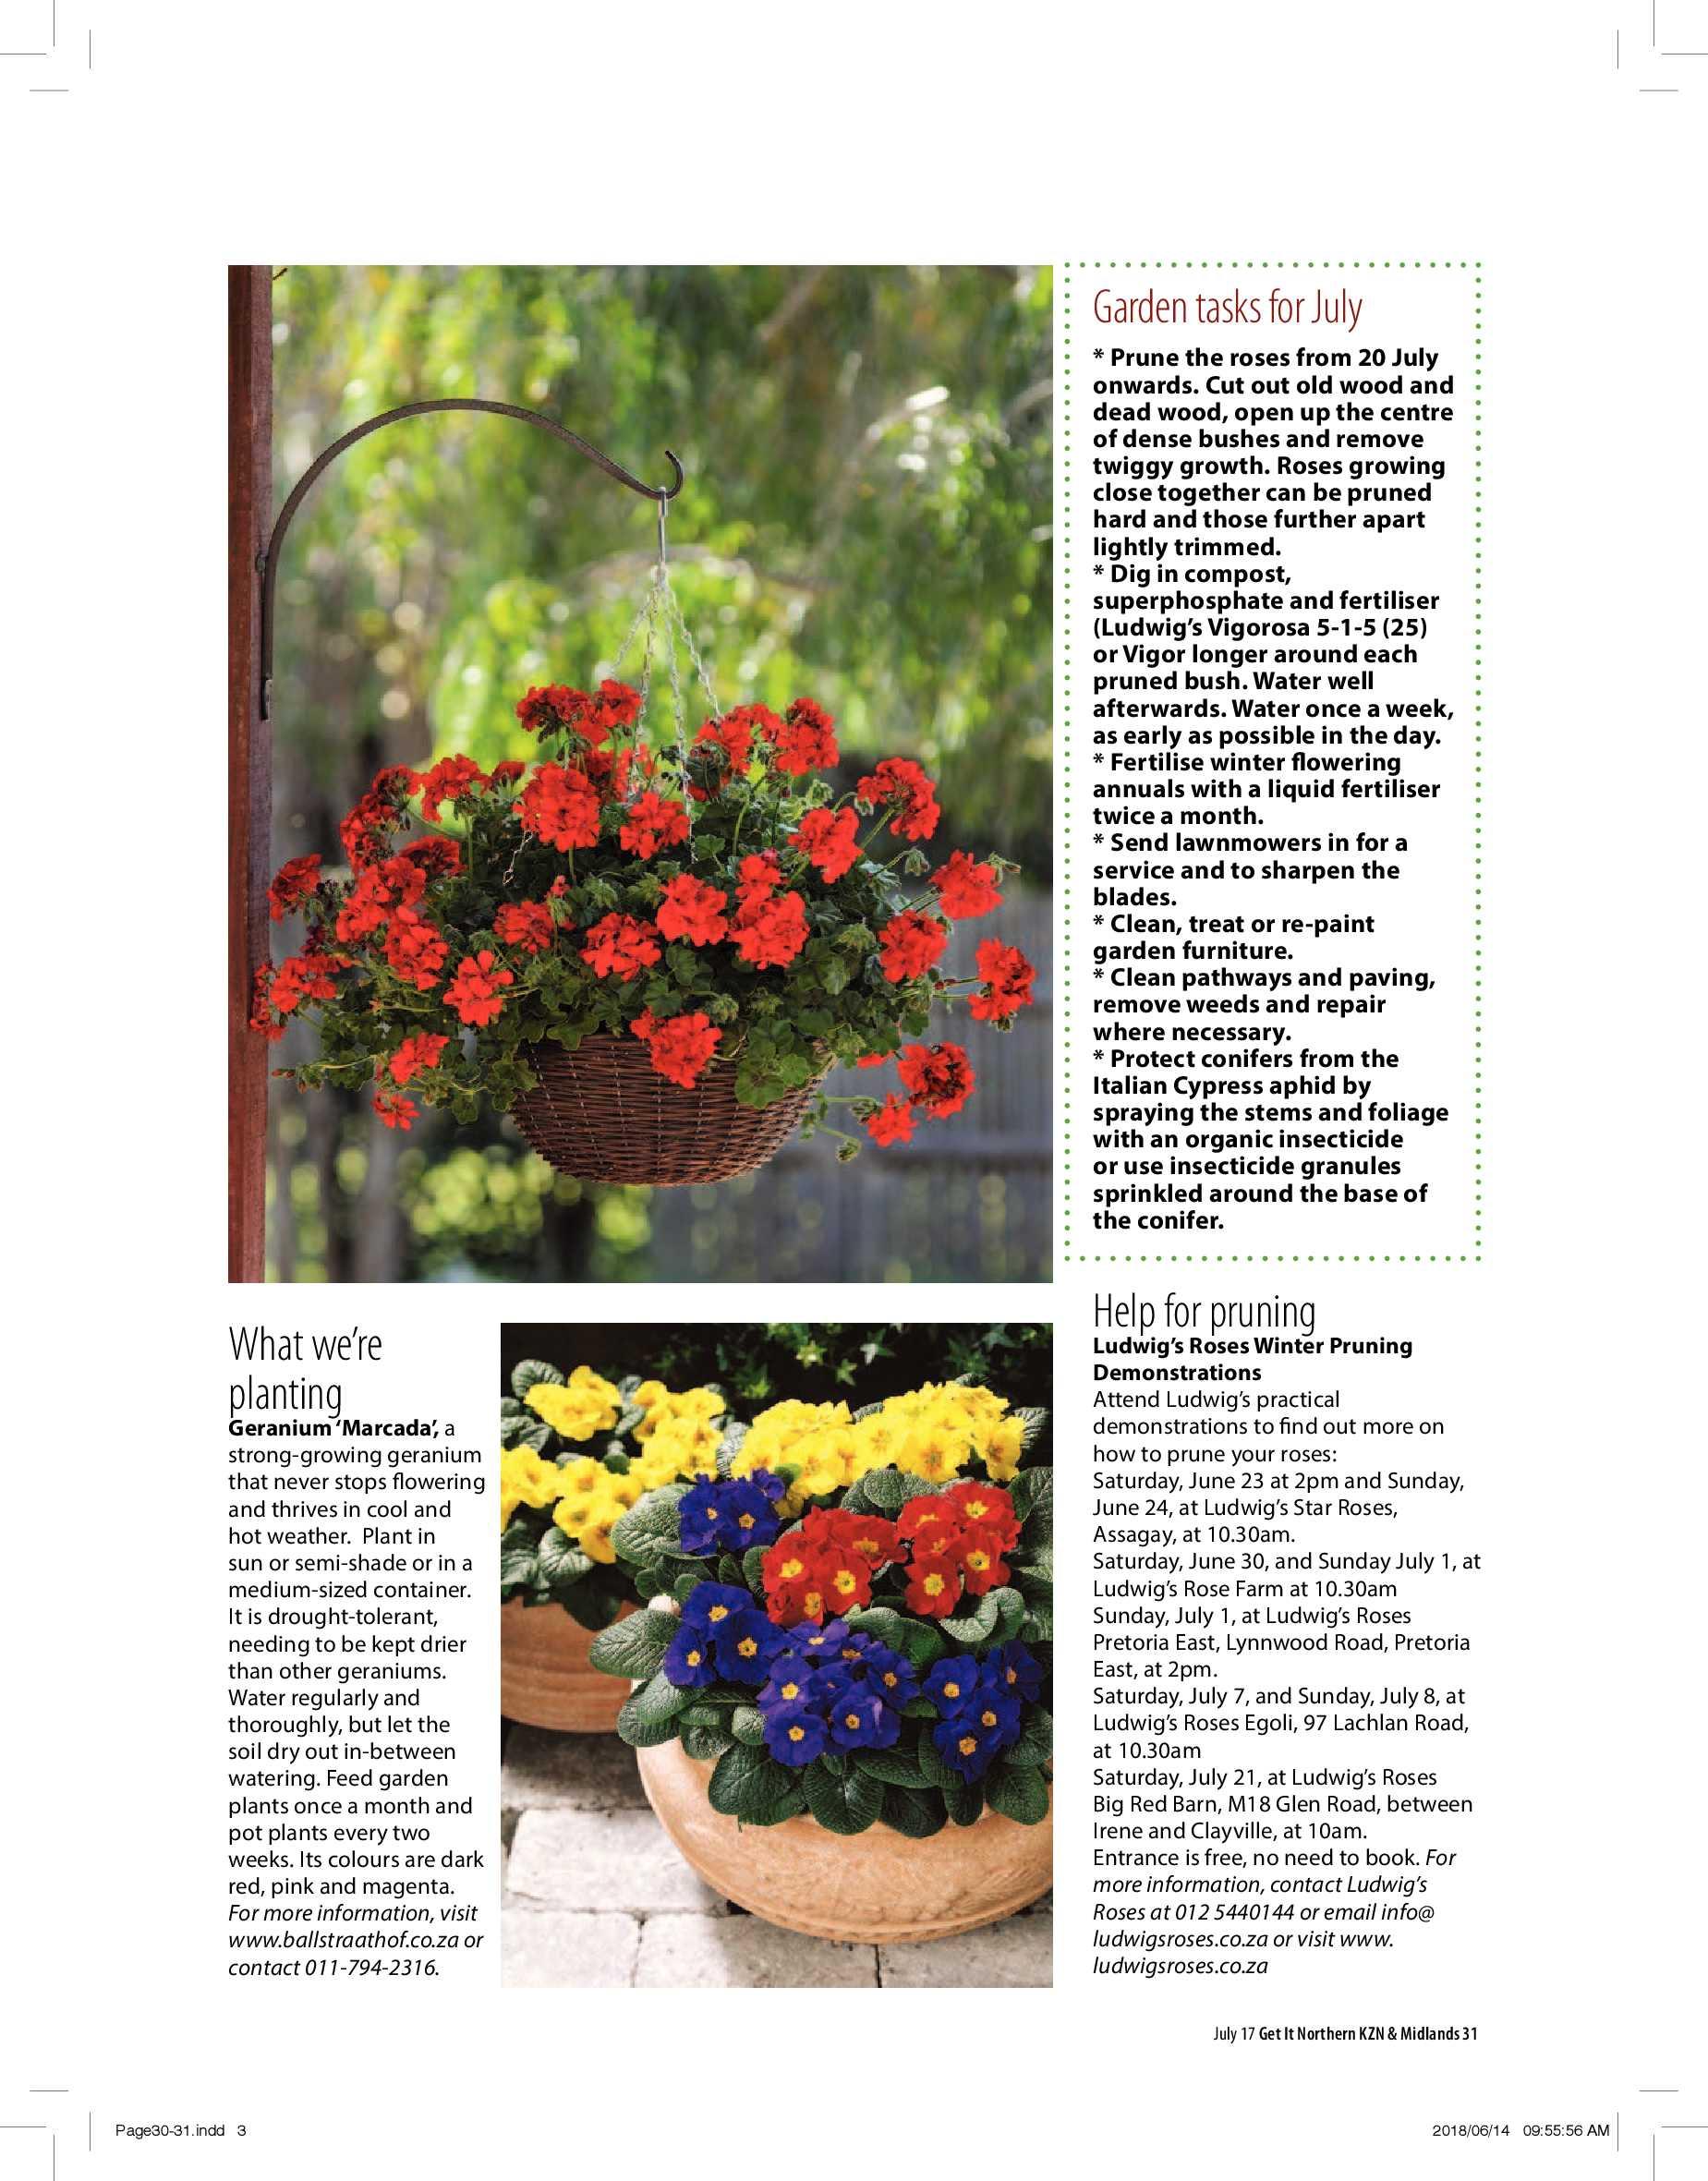 northern-kzn-midlands-get-july-2018-epapers-page-33